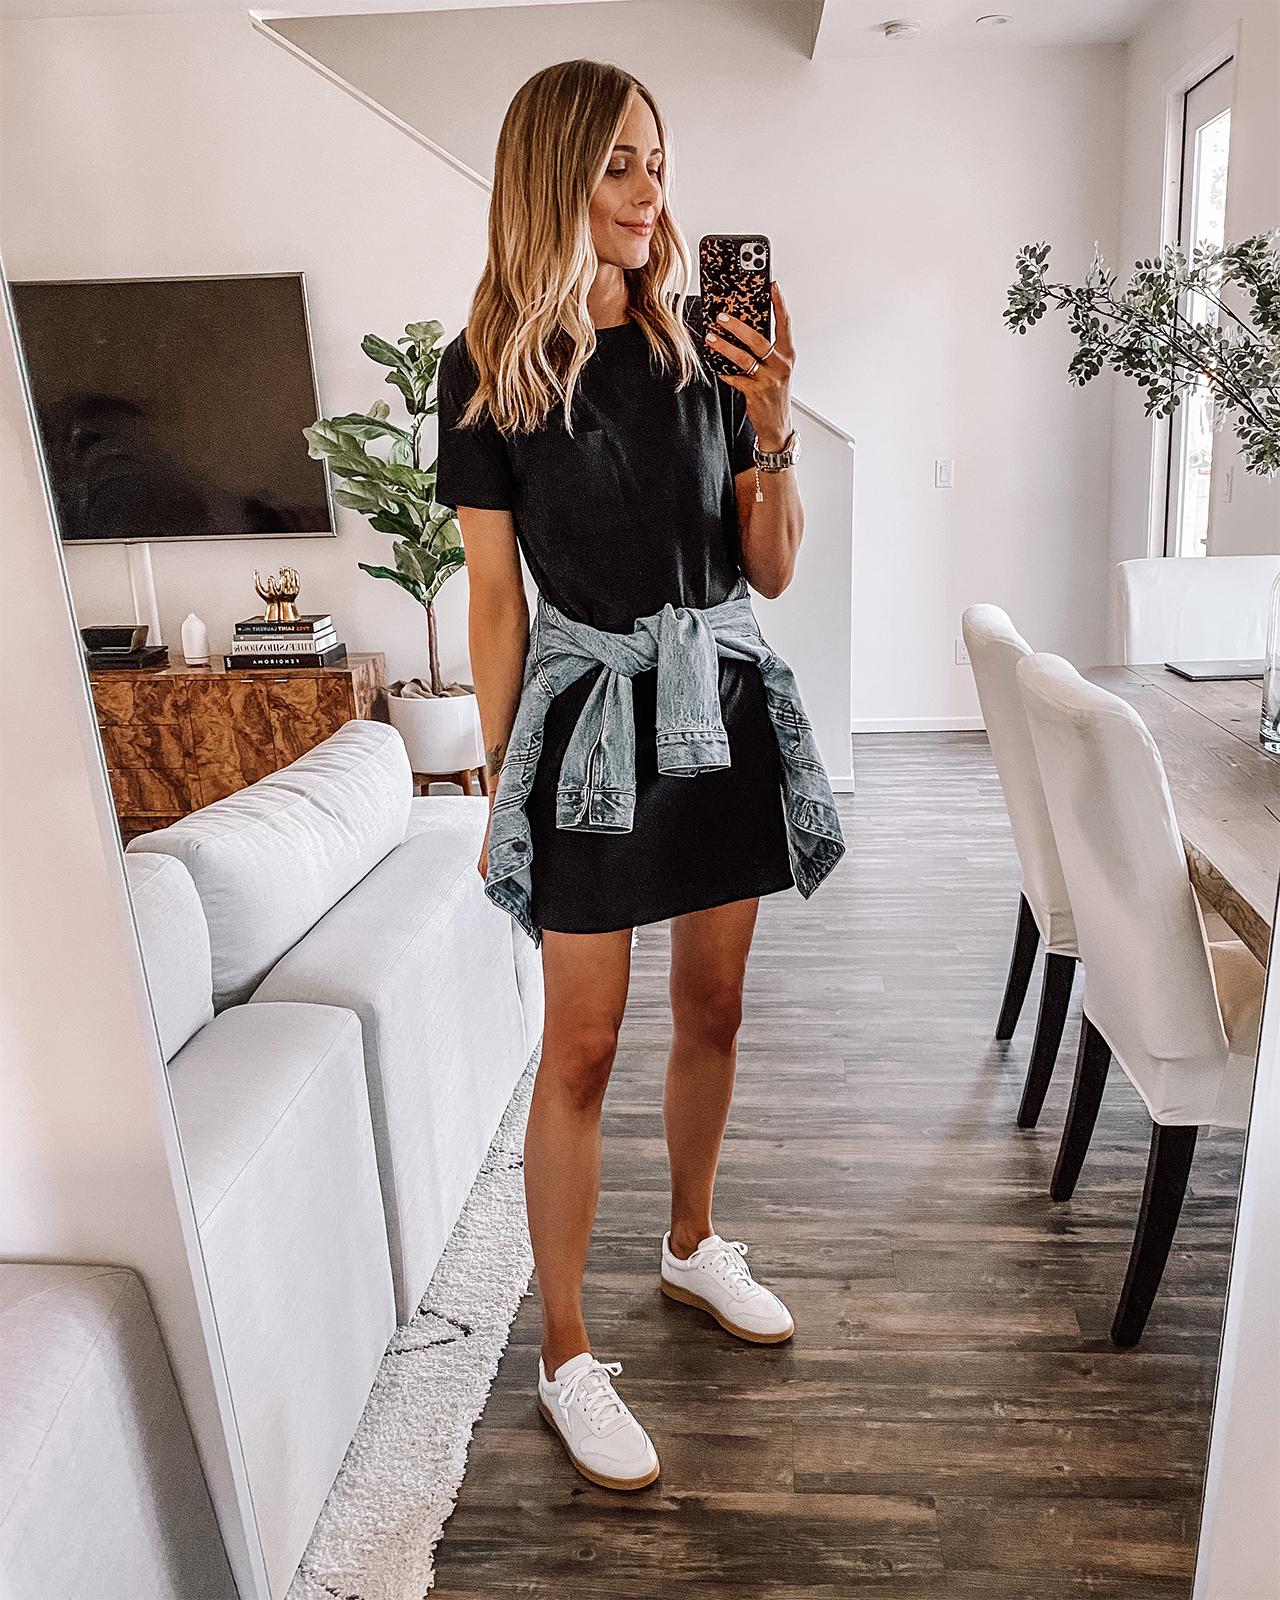 Fashion Jackson Wearing Everlane Black Tshirt Dress Everlane White Sneakers Denim Jacket